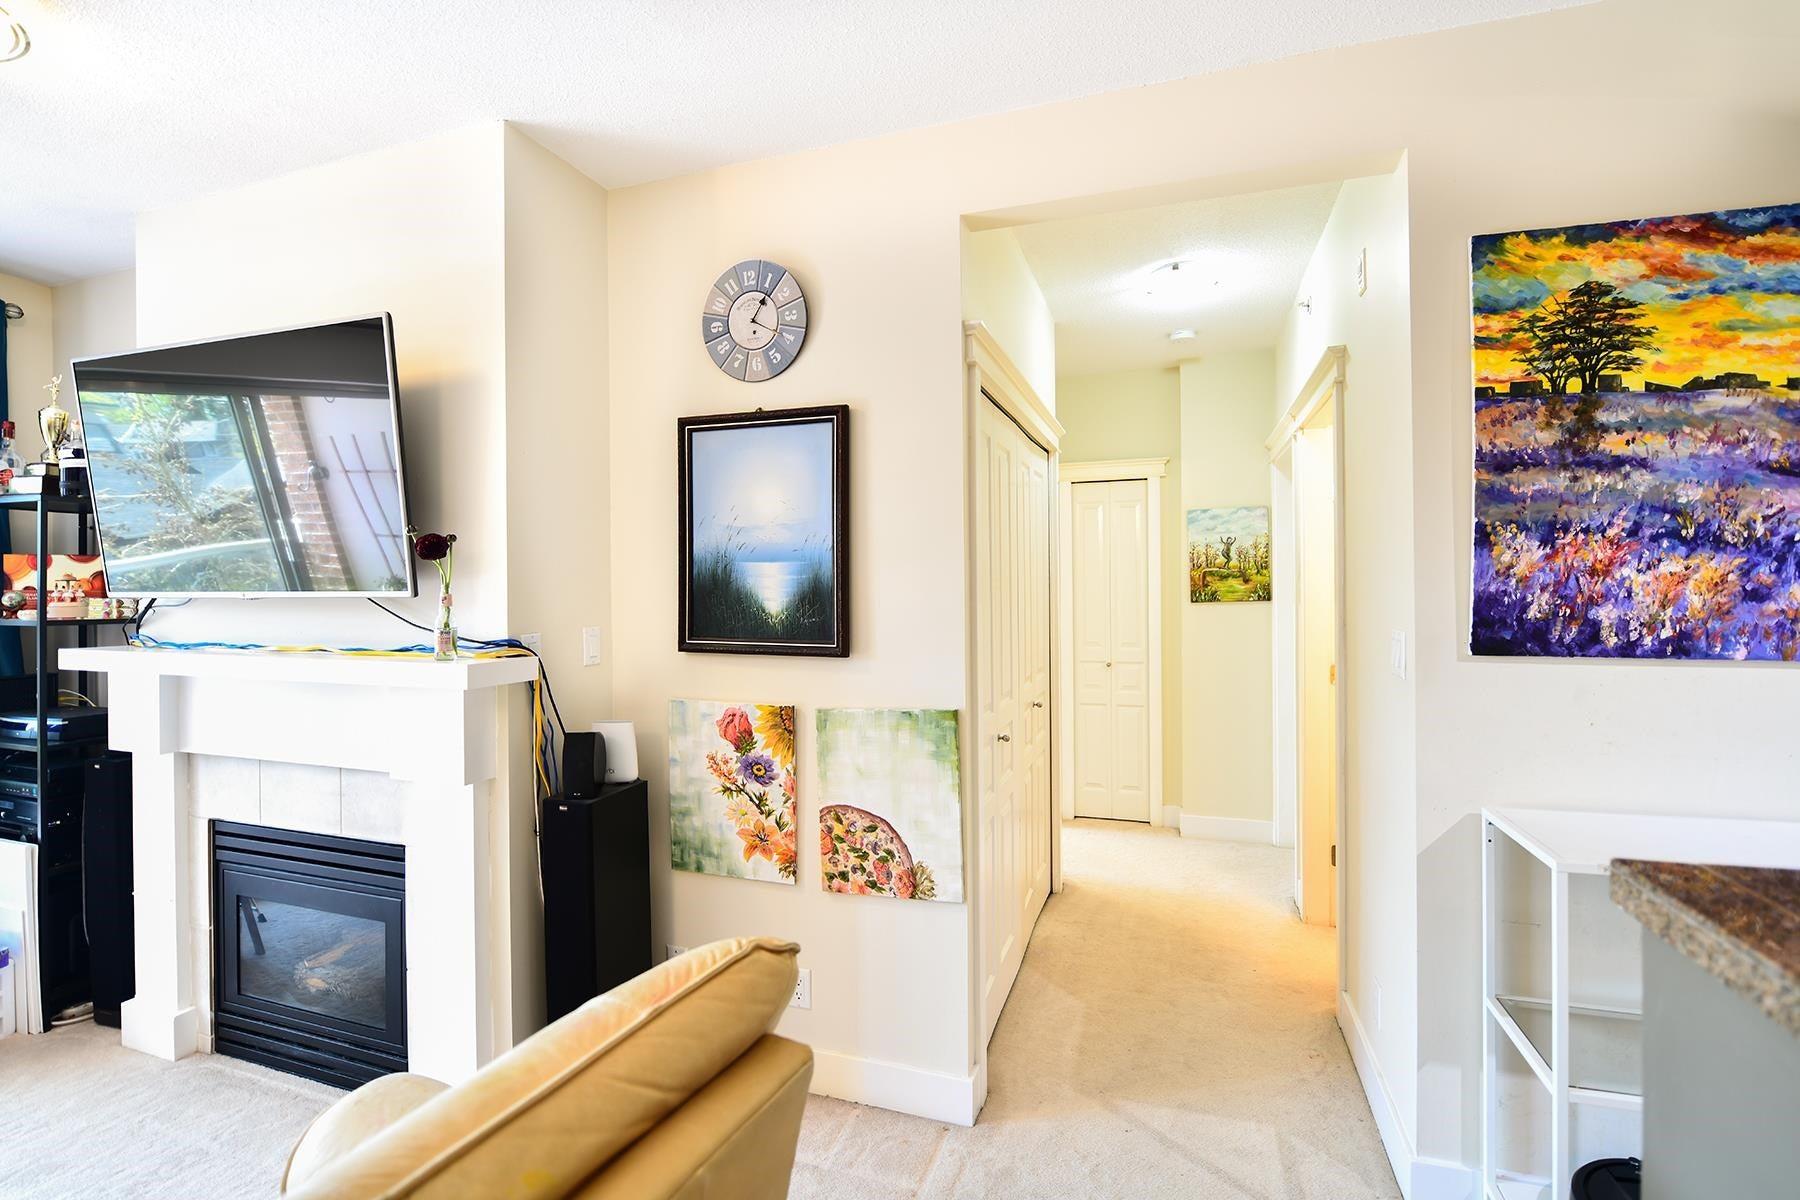 204 5790 EAST BOULEVARD - Kerrisdale Apartment/Condo for sale, 3 Bedrooms (R2604138) - #6